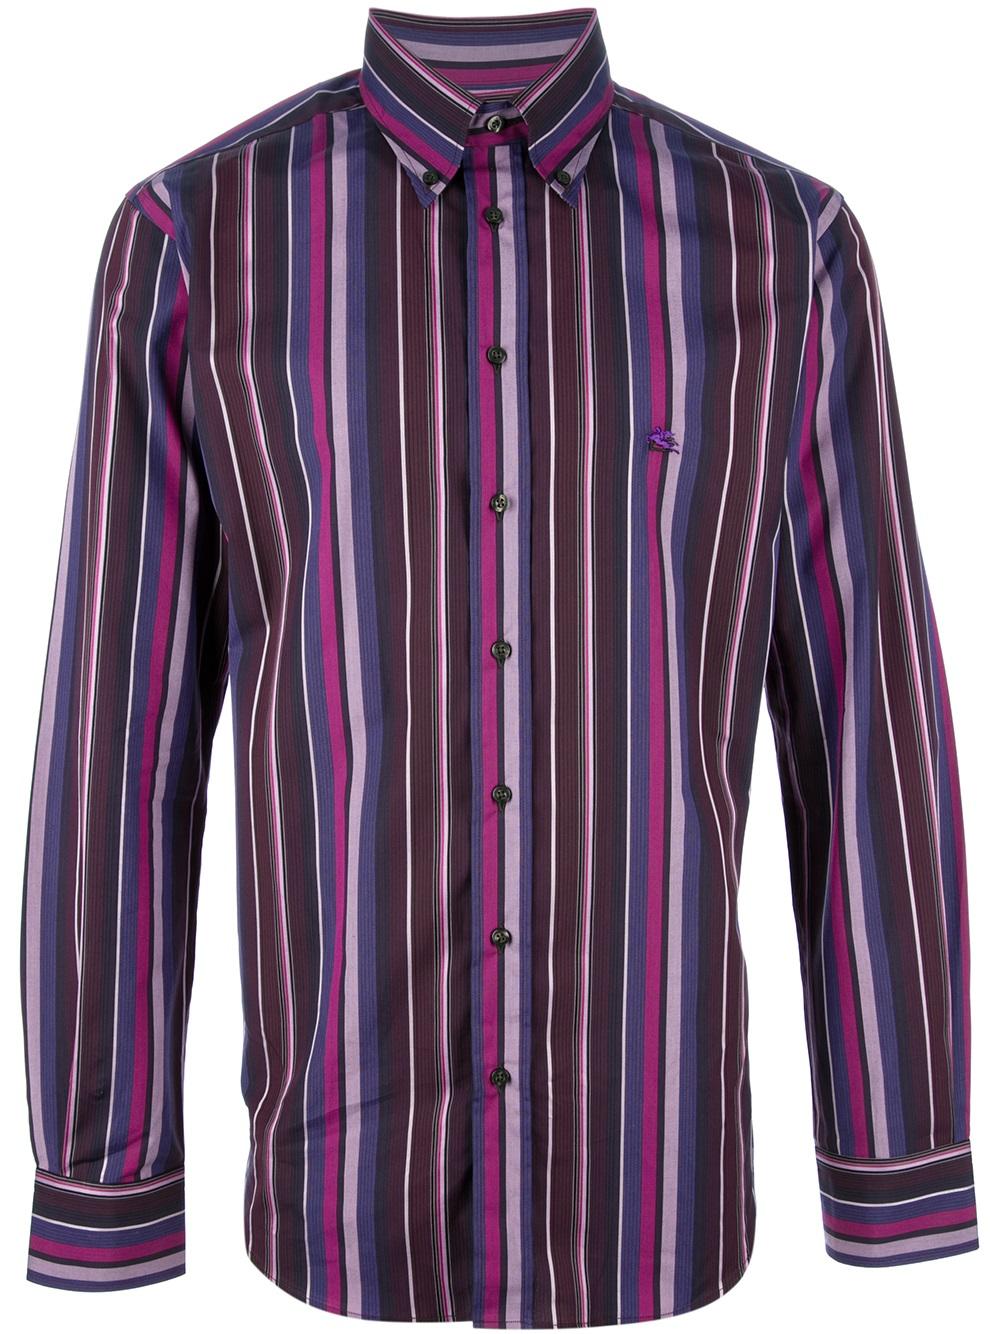 Fresh Lyst - Etro Striped Shirt in Purple for Men ZW23